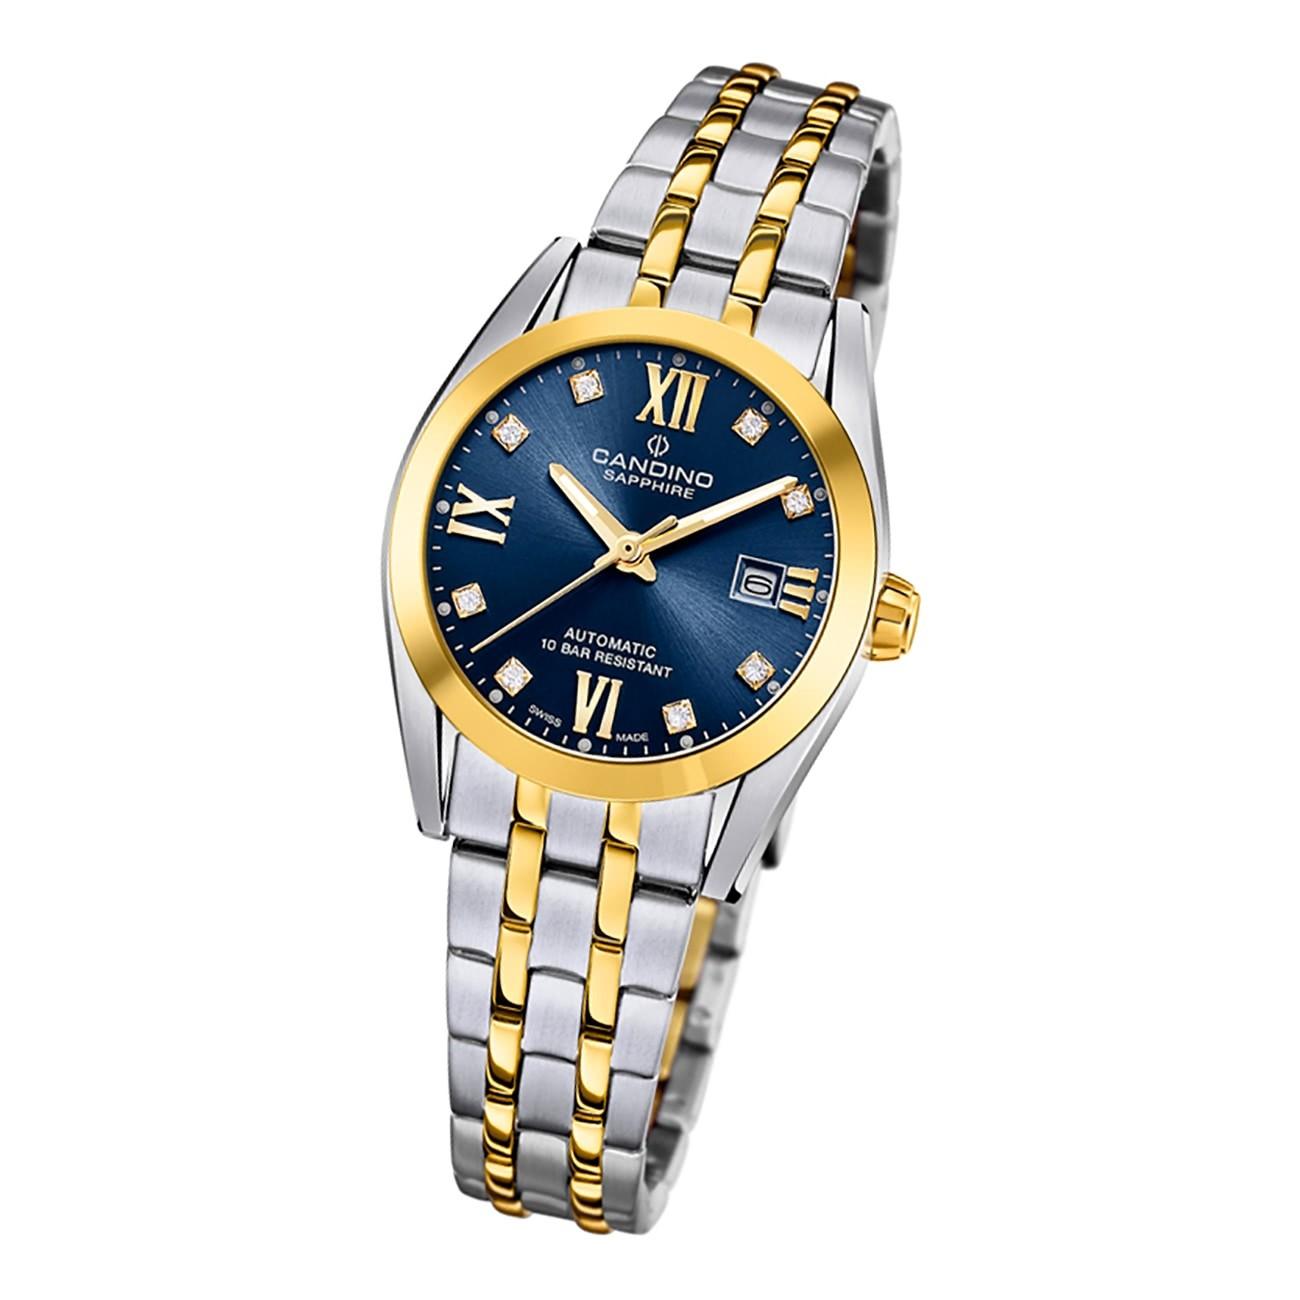 Candino Damen Armbanduhr Automatik C4704/2 Analog Edelstahl silber gold UC4704/2